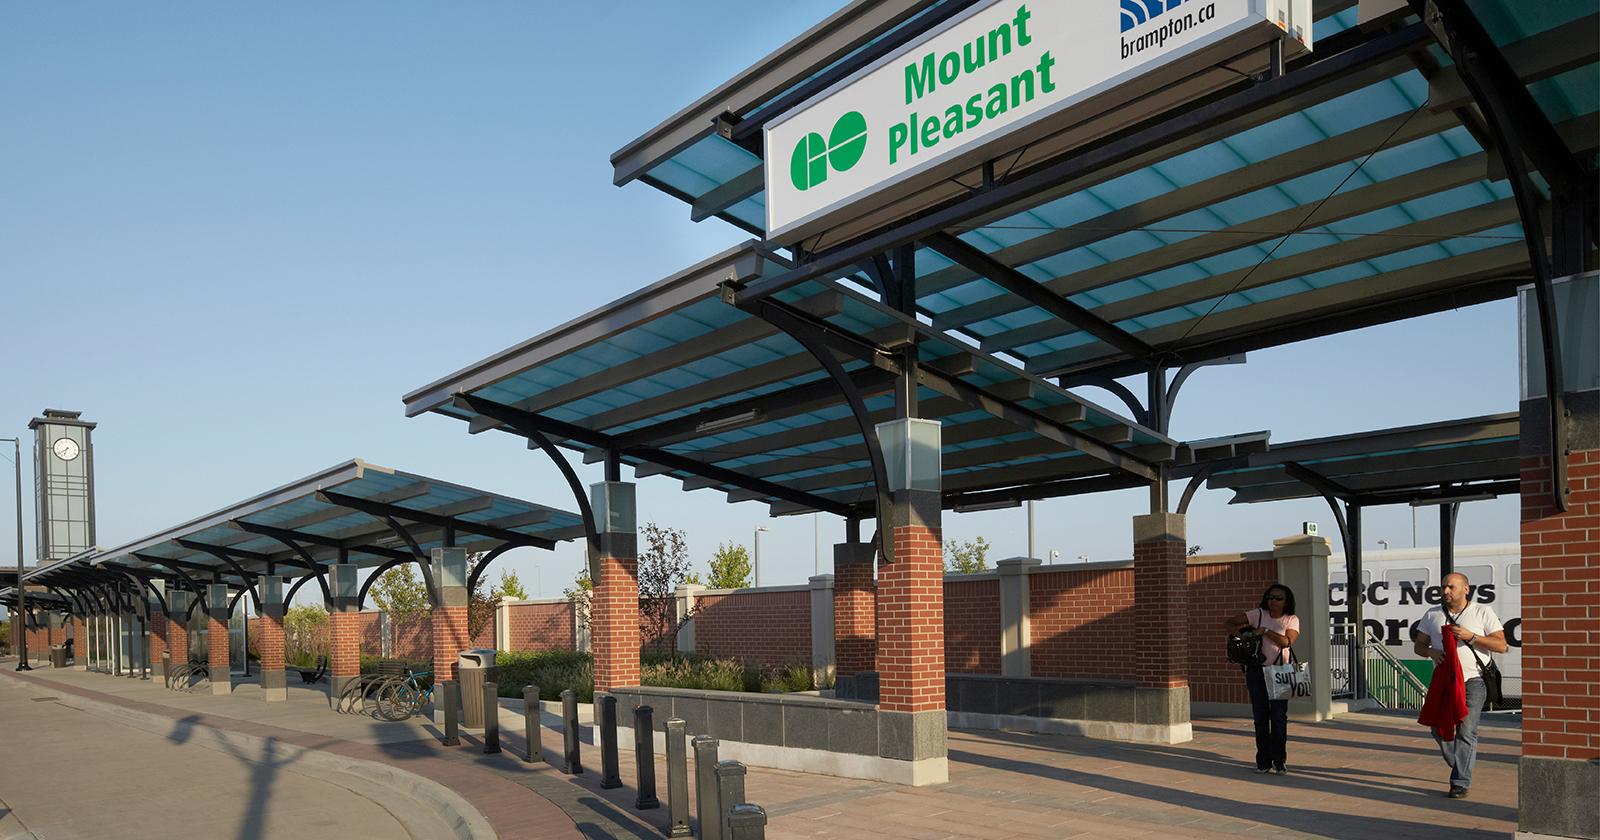 Mount Pleasant Village, Brampton, ON